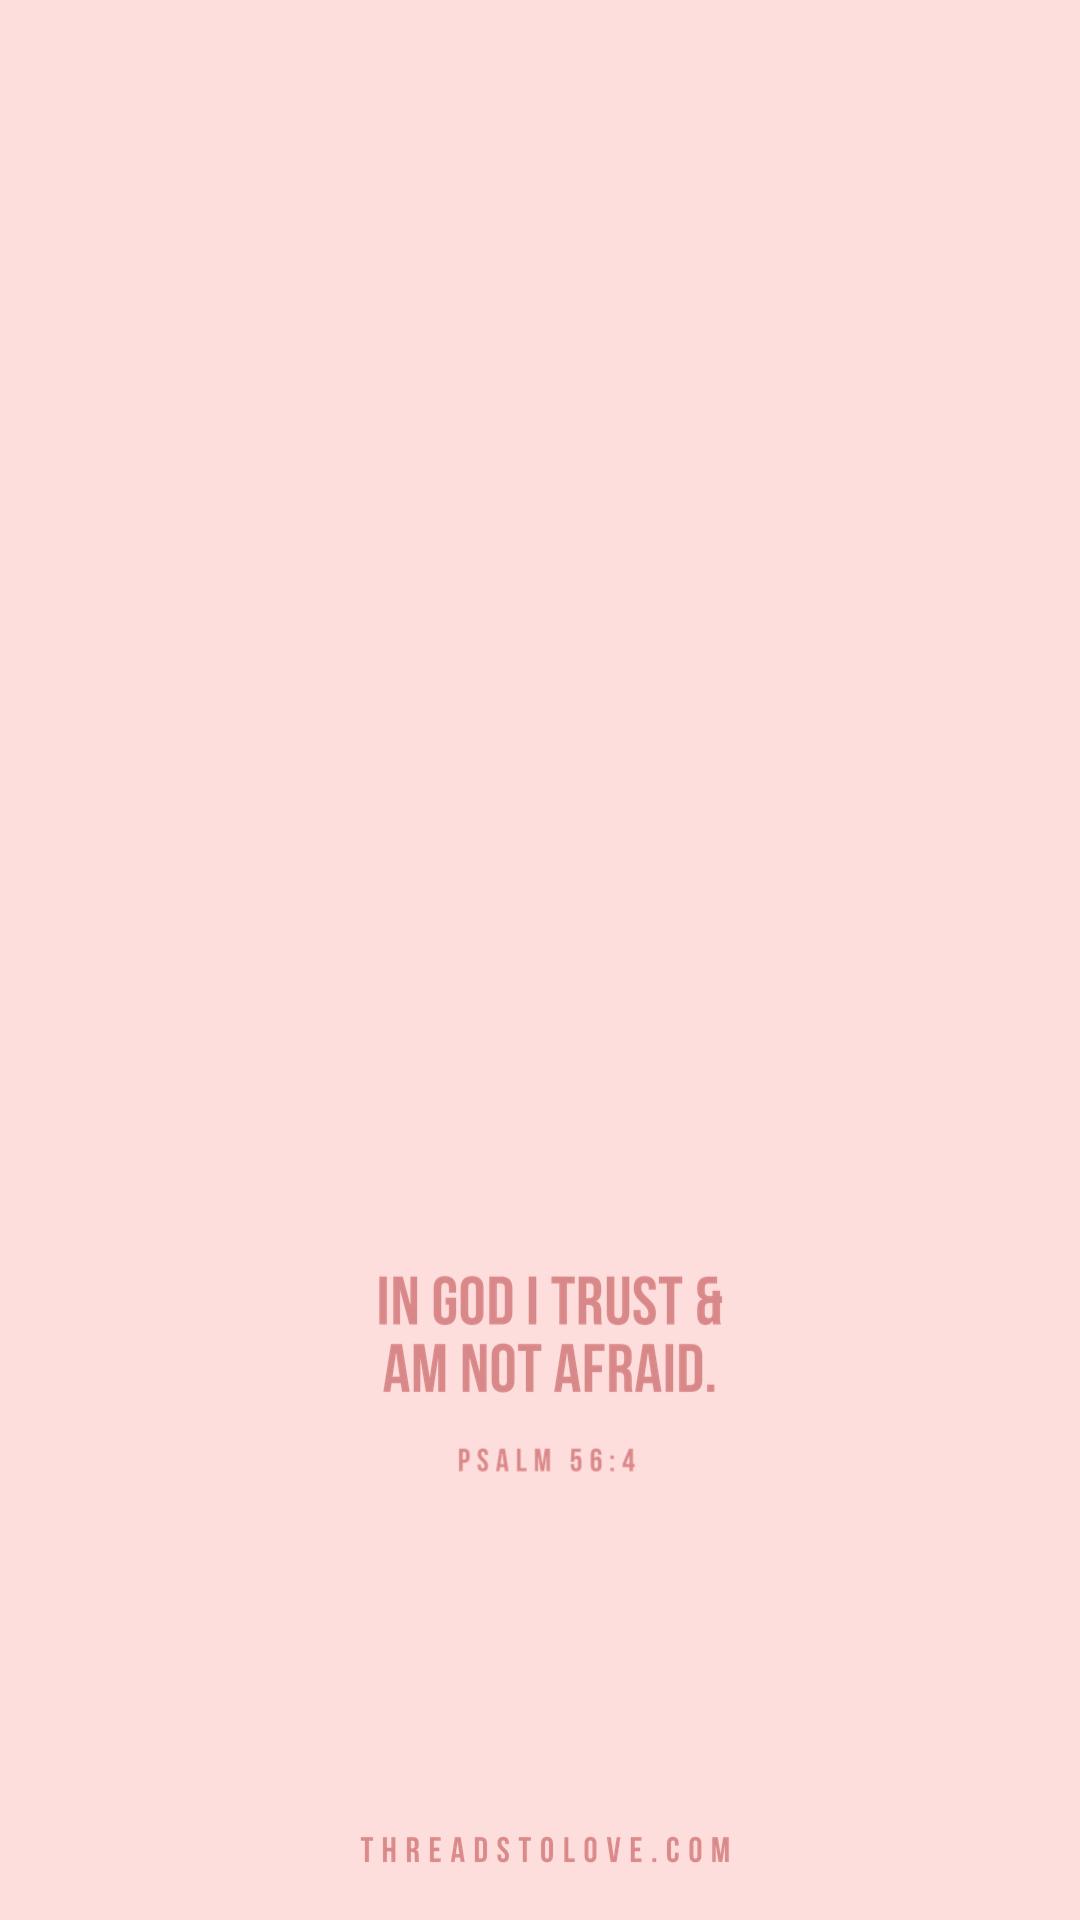 In God I Trust & Am Not Afraid